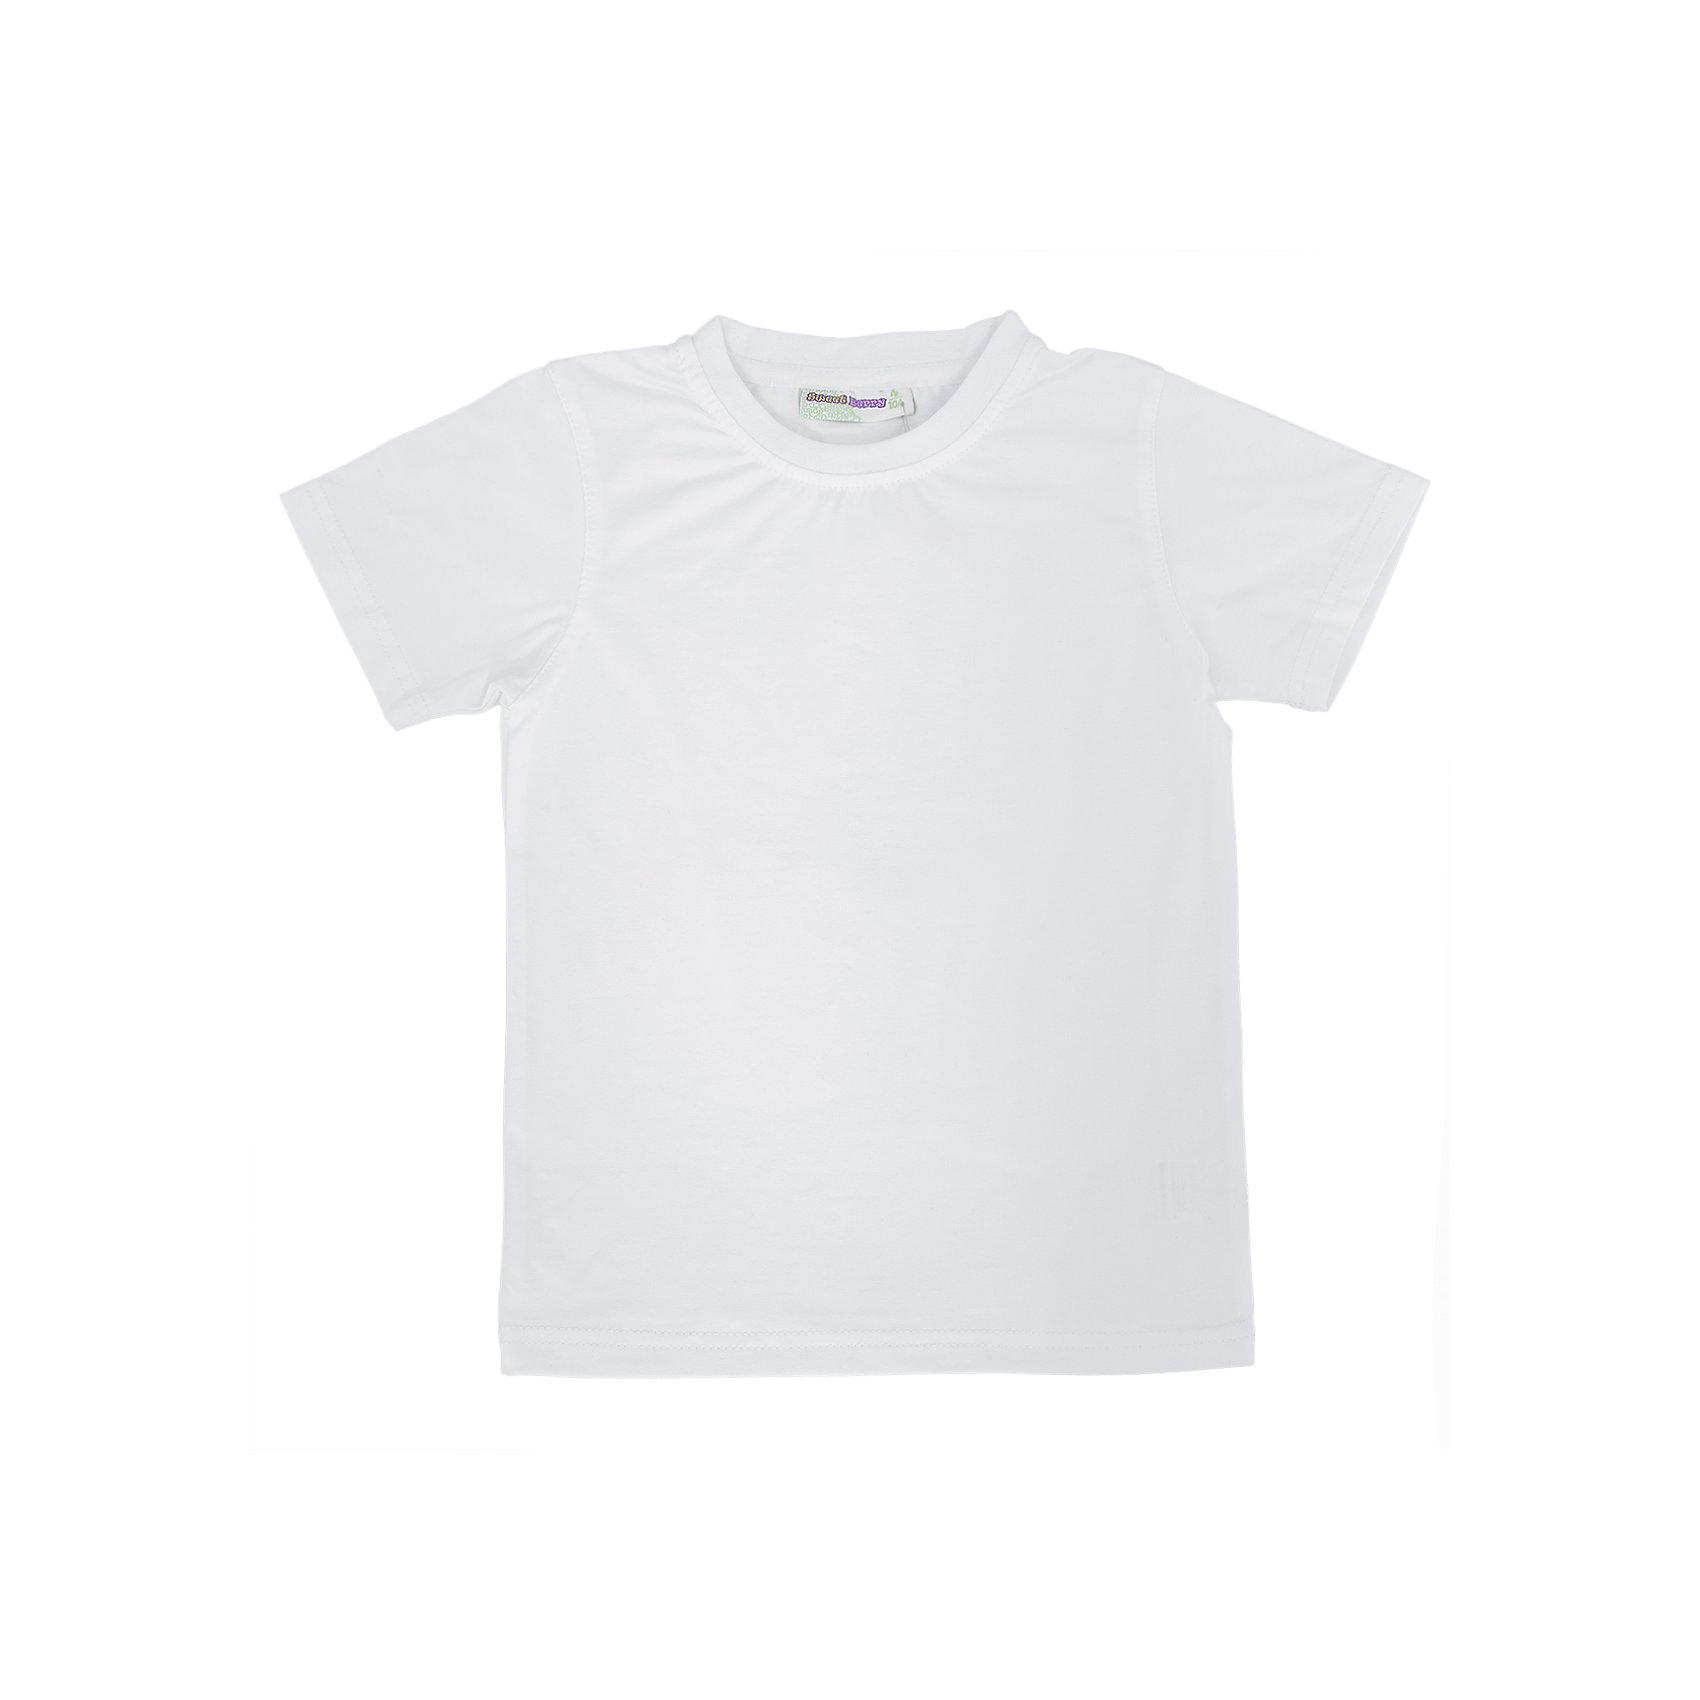 Футболка для мальчика Sweet BerryФутболки, поло и топы<br>Базовая футболка для мальчиков.<br>Состав:<br>95% хлопок 5% эластан<br><br>Ширина мм: 199<br>Глубина мм: 10<br>Высота мм: 161<br>Вес г: 151<br>Цвет: белый<br>Возраст от месяцев: 24<br>Возраст до месяцев: 36<br>Пол: Мужской<br>Возраст: Детский<br>Размер: 104,110,116,122,128,98<br>SKU: 4930802